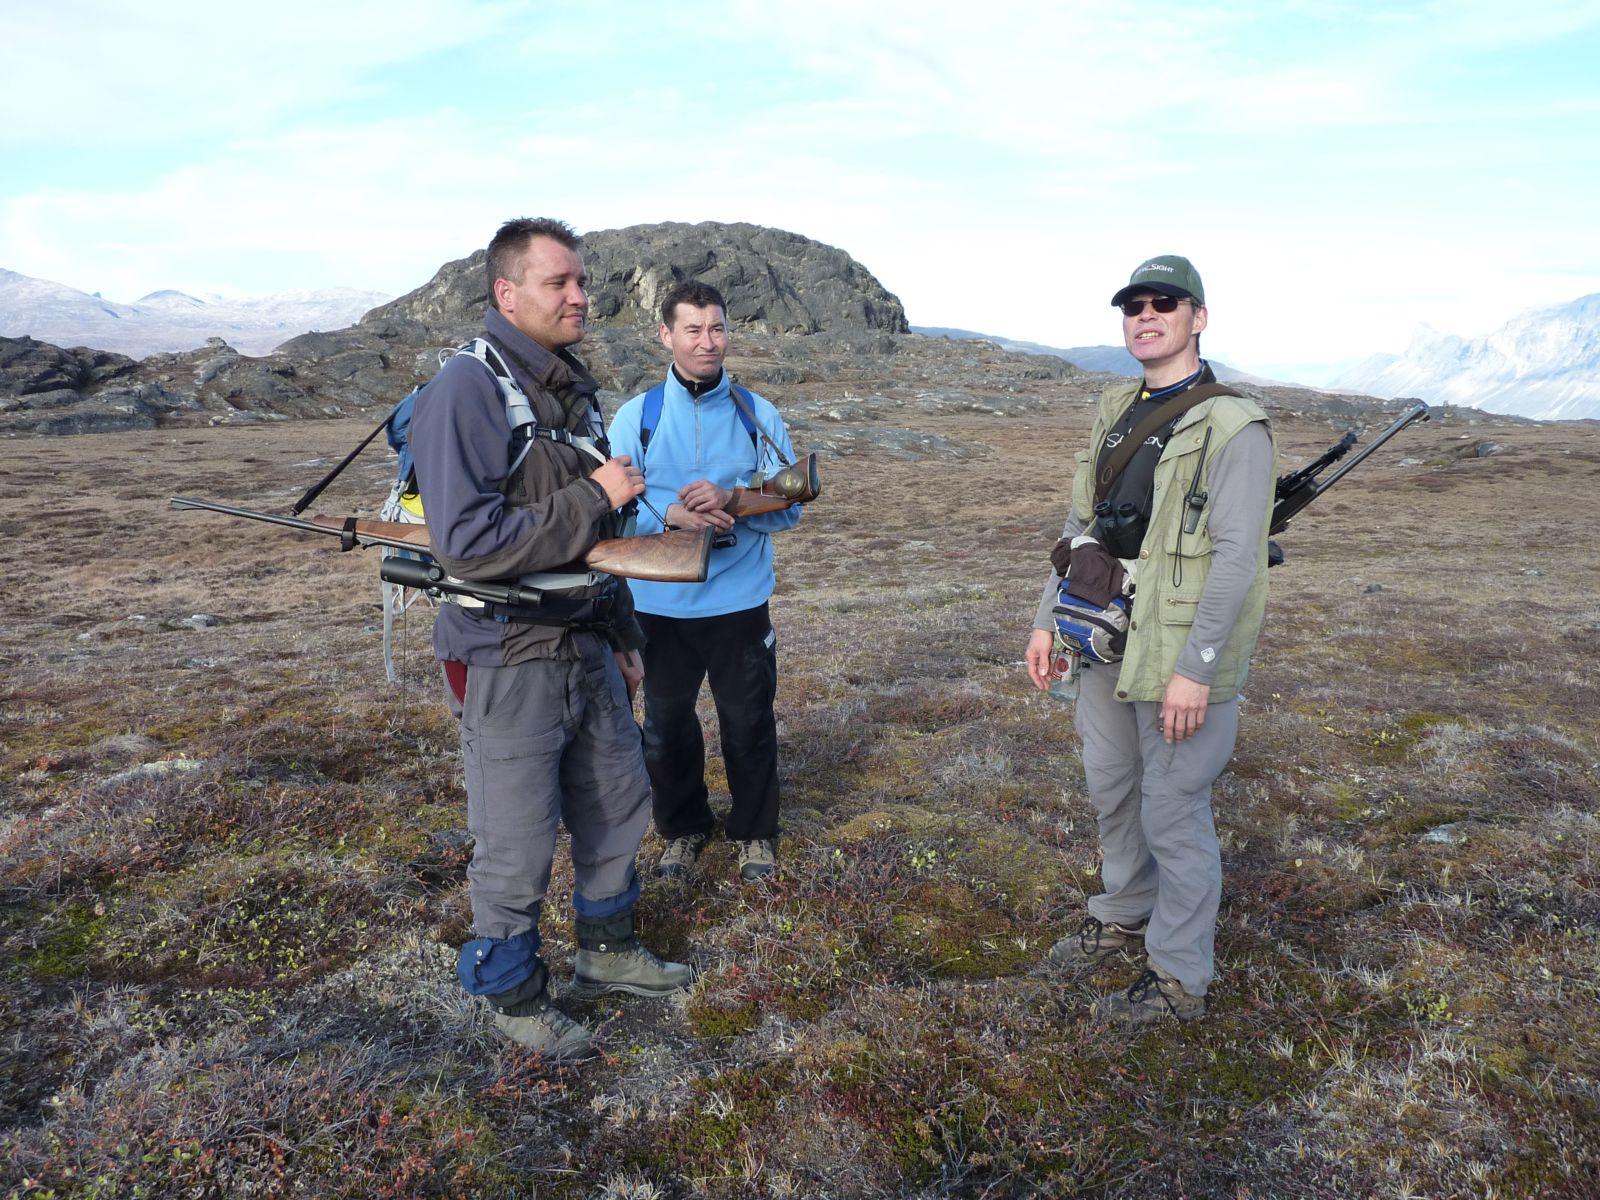 2010-09-25-1002_-_Jesper Eugenius Labansen; John Telling; Svend Sværd